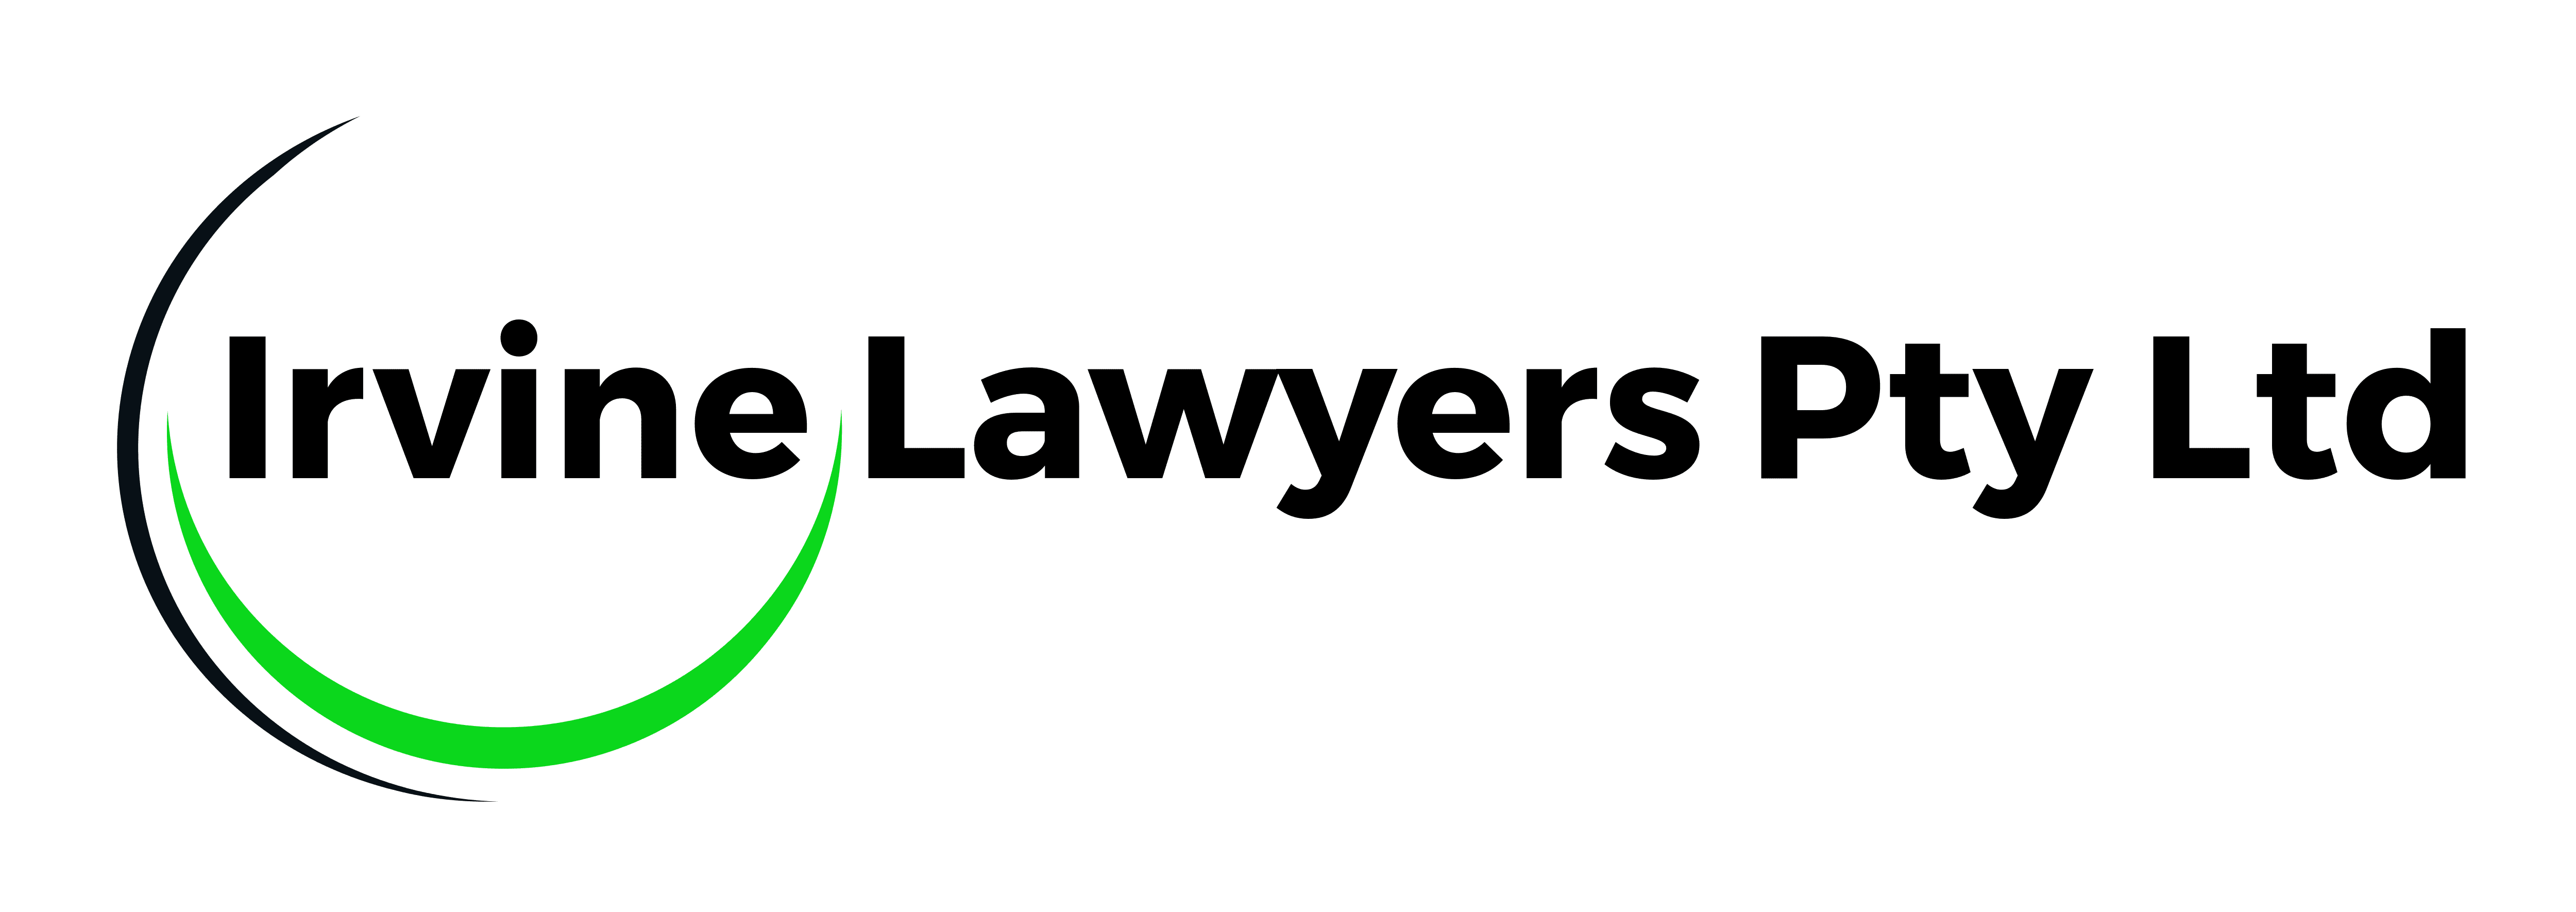 Irvine Lawyers